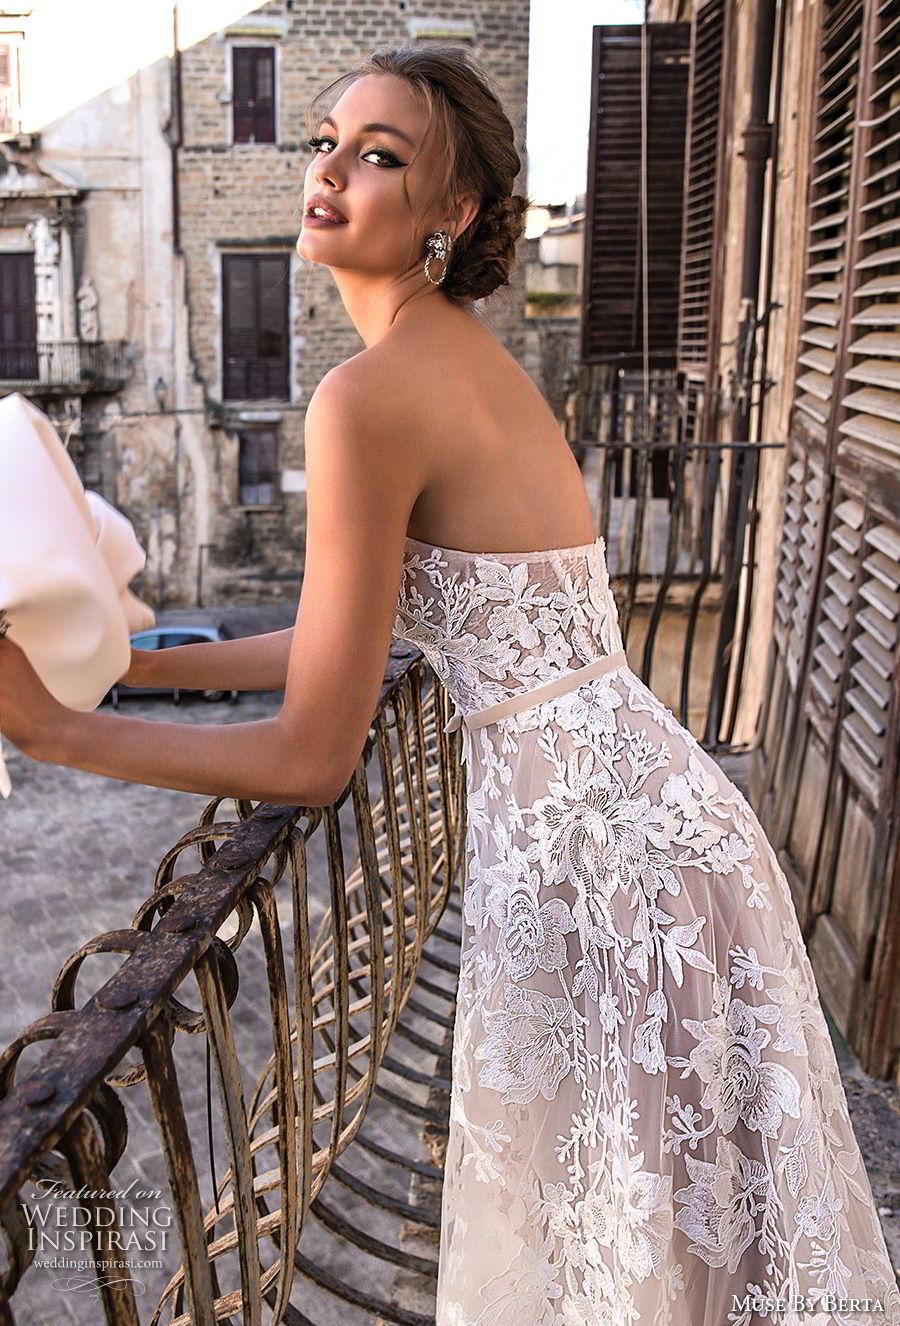 muse-berta-2018-bridal-strapless-sweetheart-neckline-full-embellishment-romantic-a-line-wedding-dress-medium-train-11-sdv